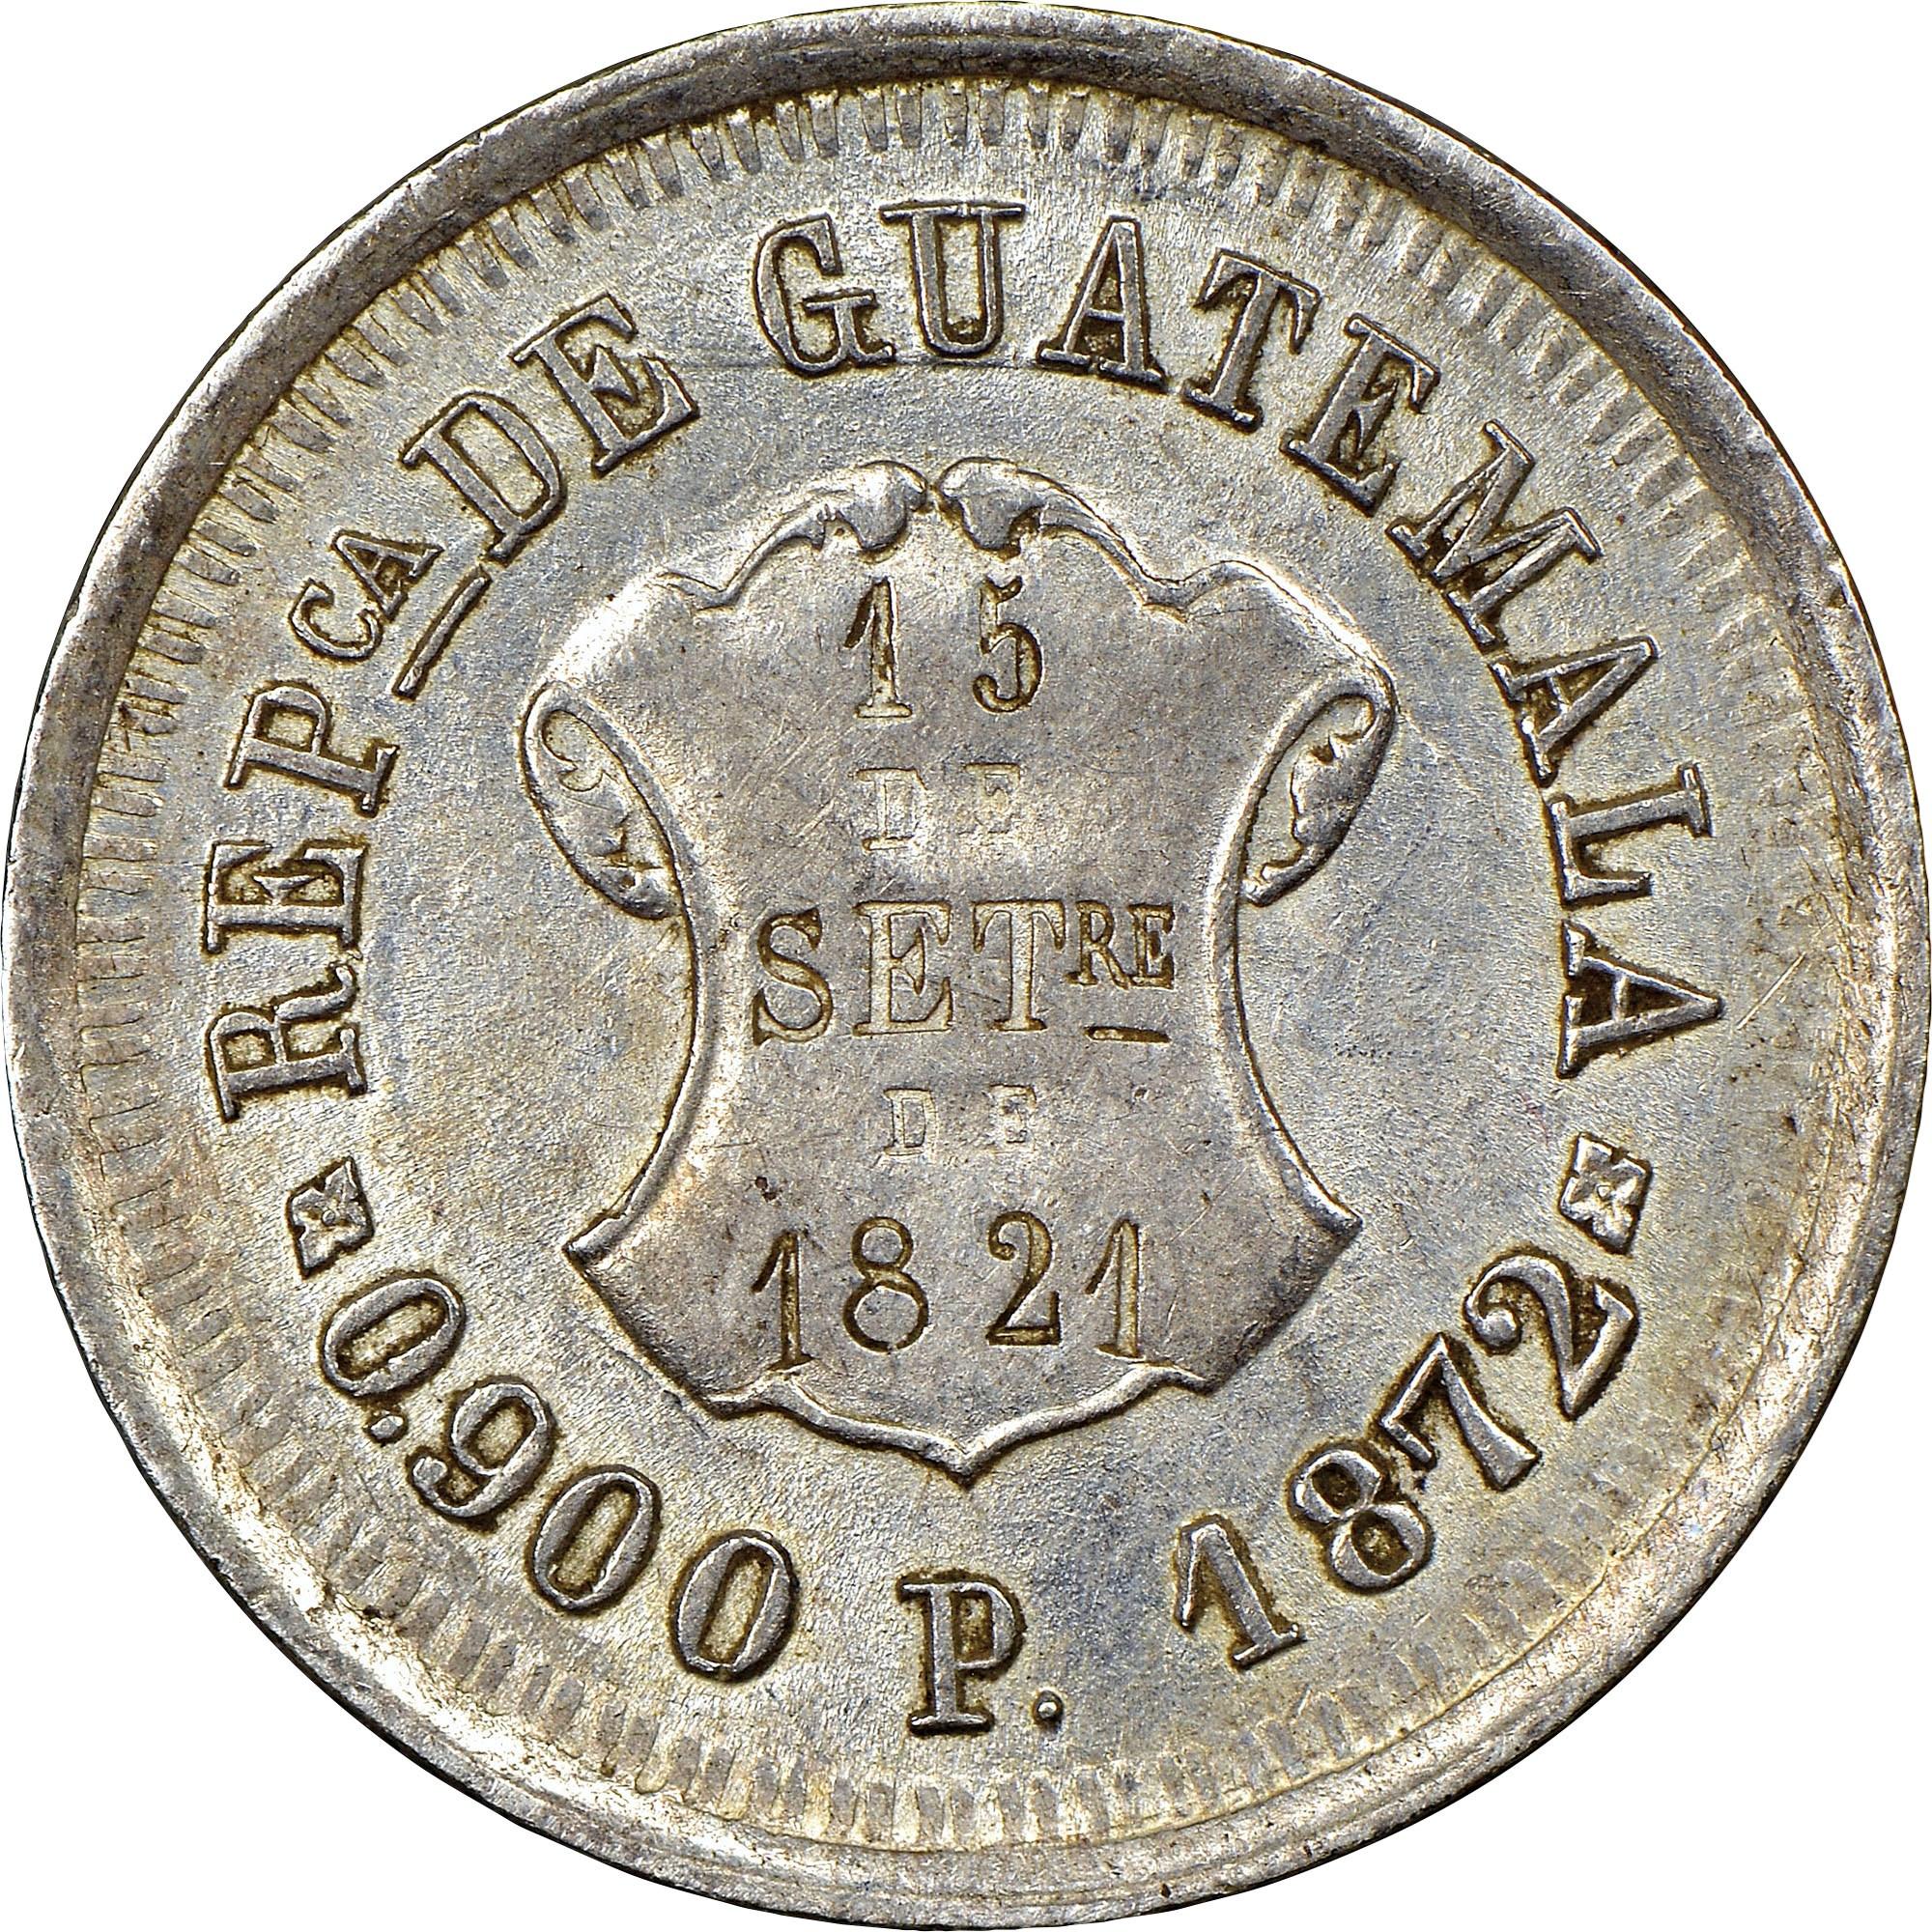 Guatemala Real obverse